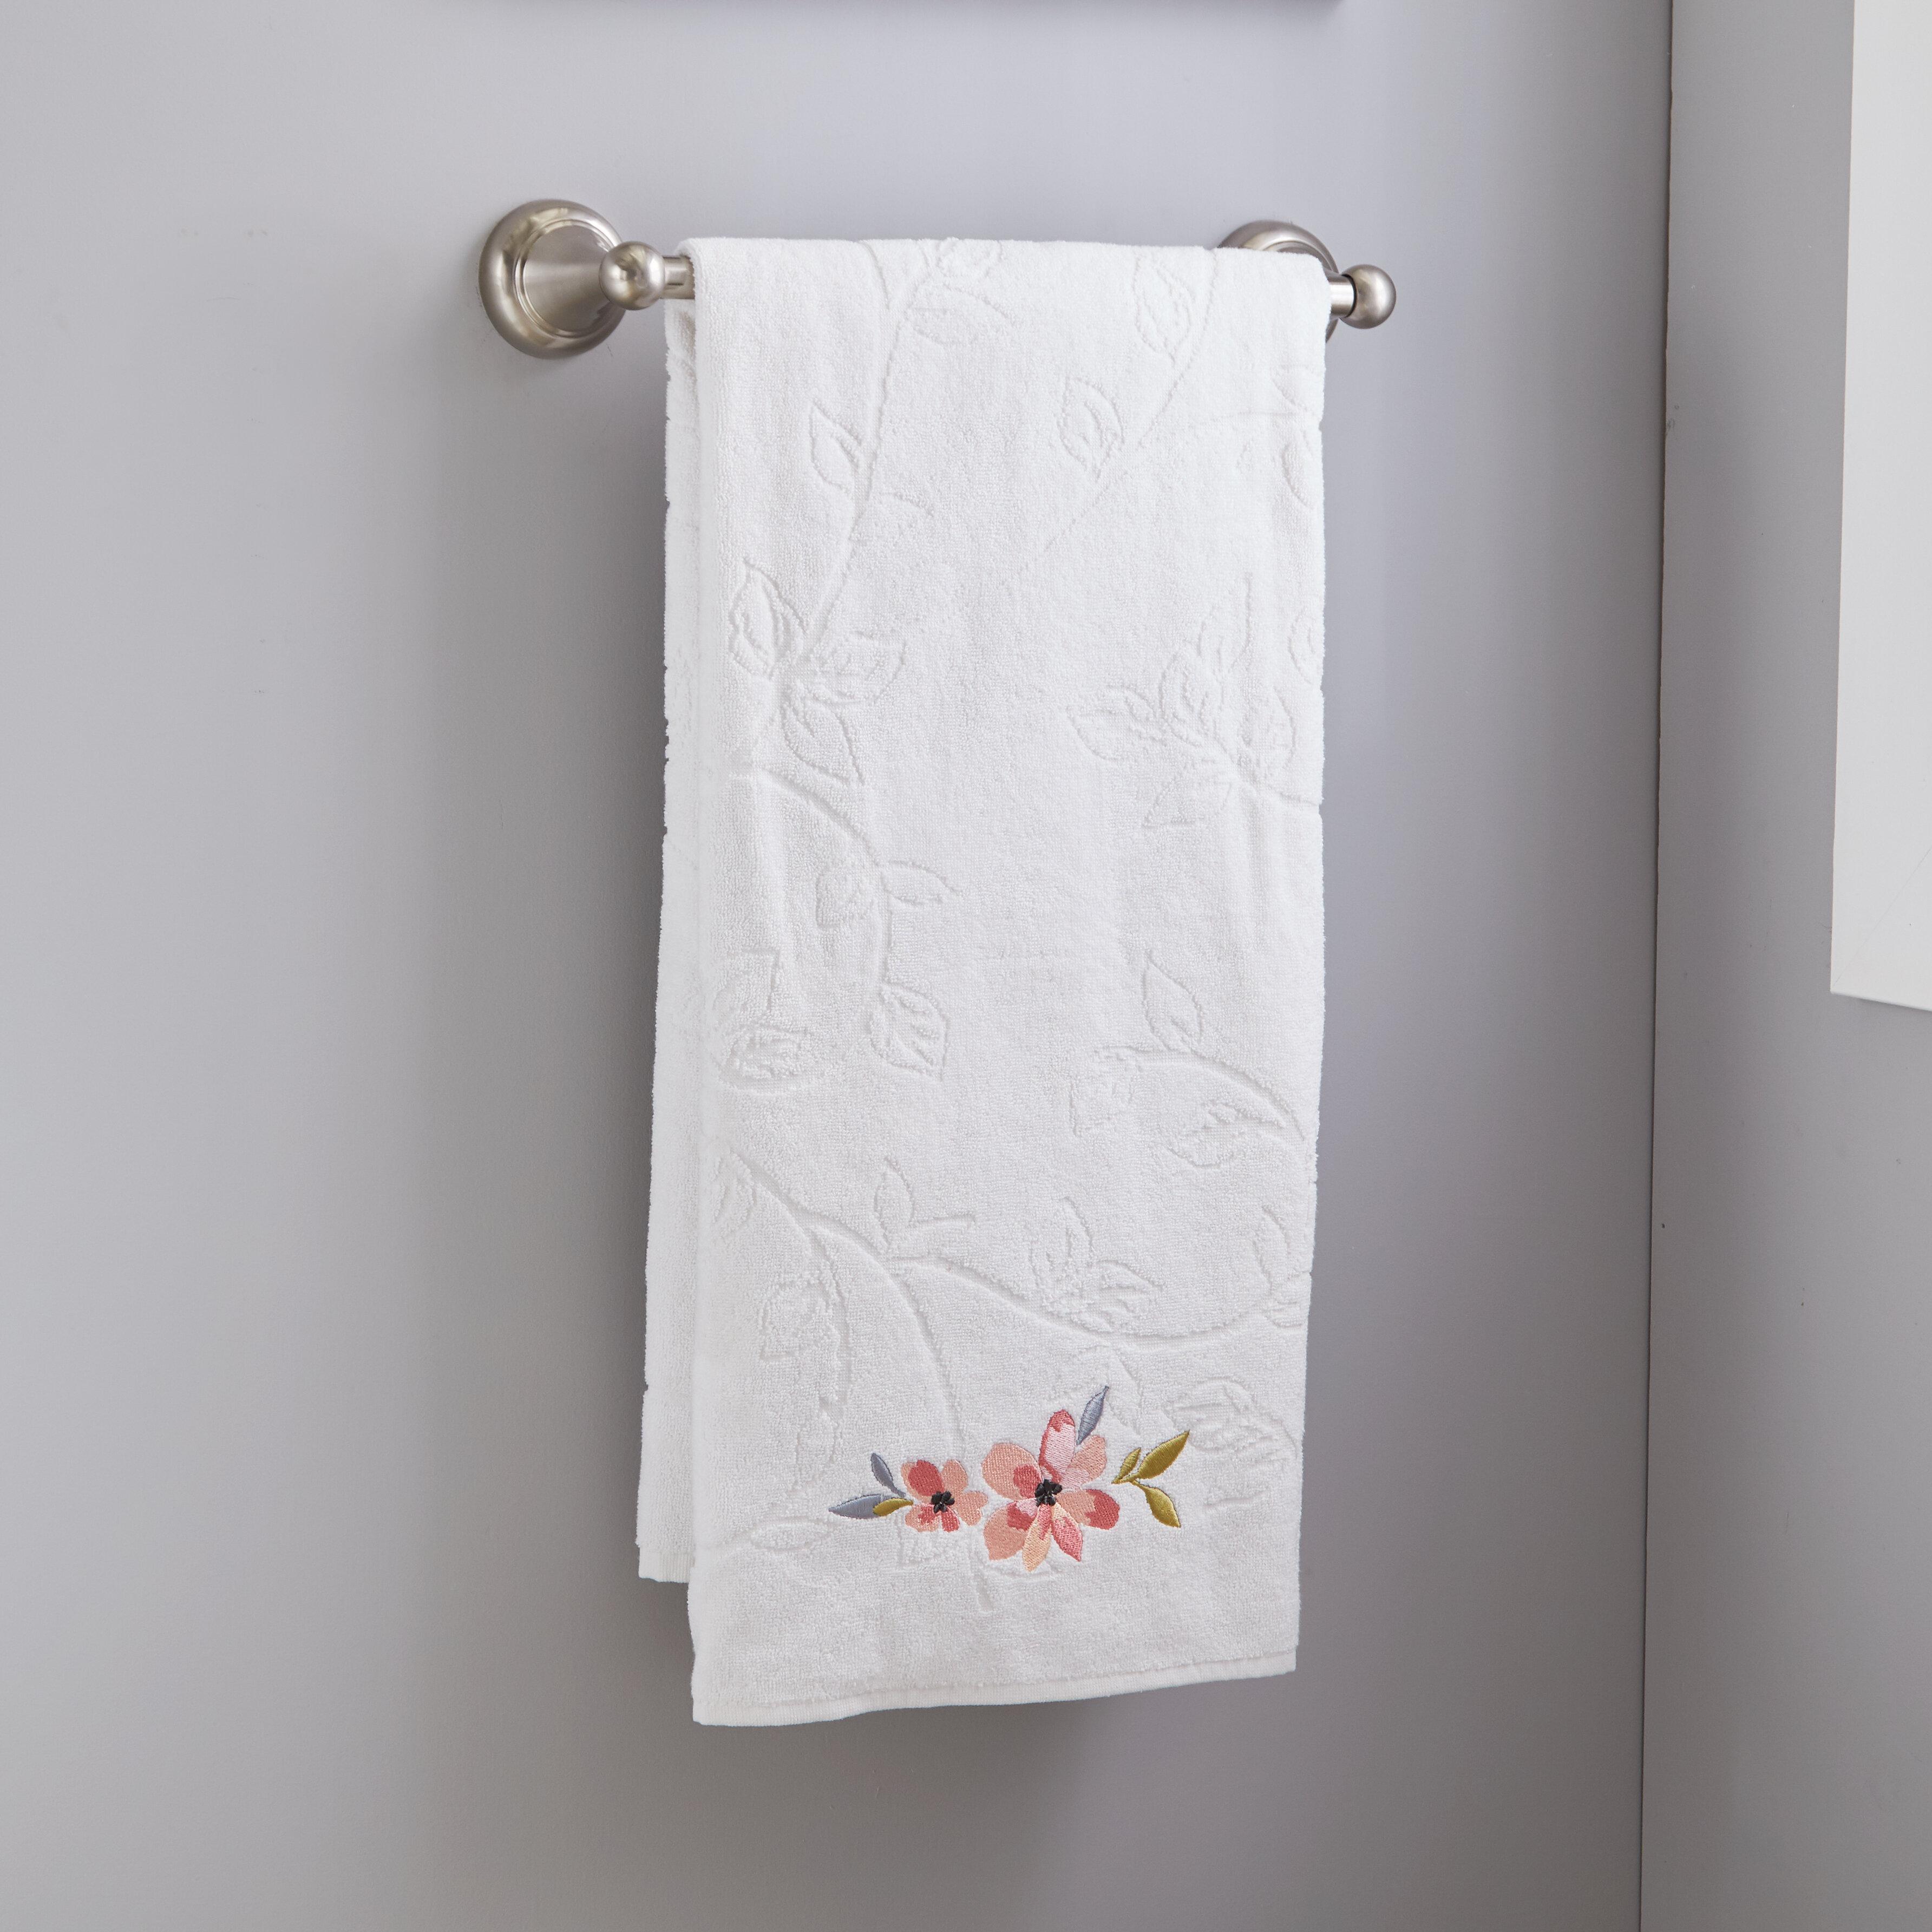 BATH TUB TIME TWEETS EMBROIDERED SET 2 BATHROOM HAND TOWEL by laura